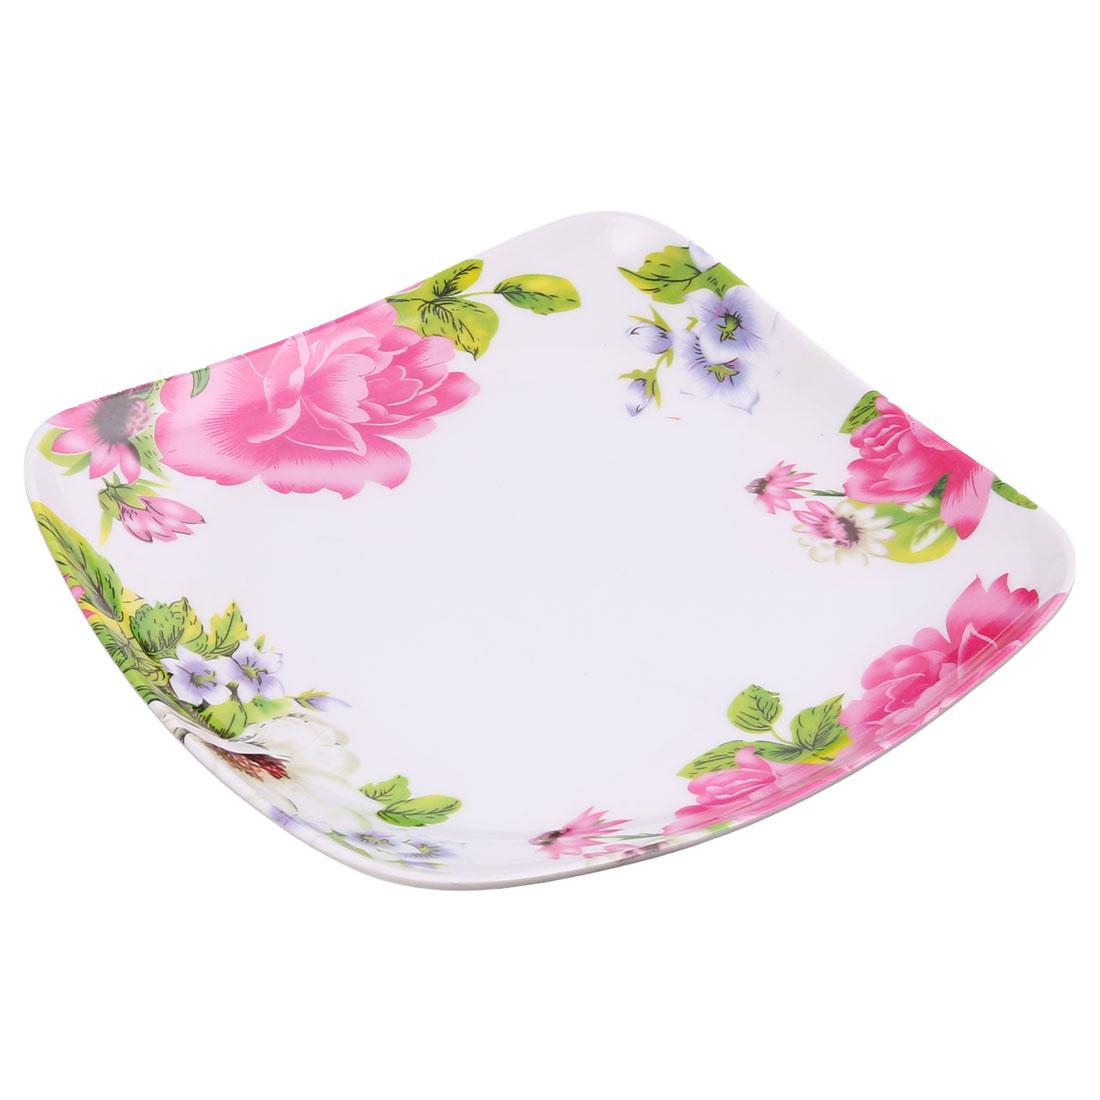 Kitchen Plastic Square Shaped Flower Pattern Food Dessert Plate Tray Fuchsia